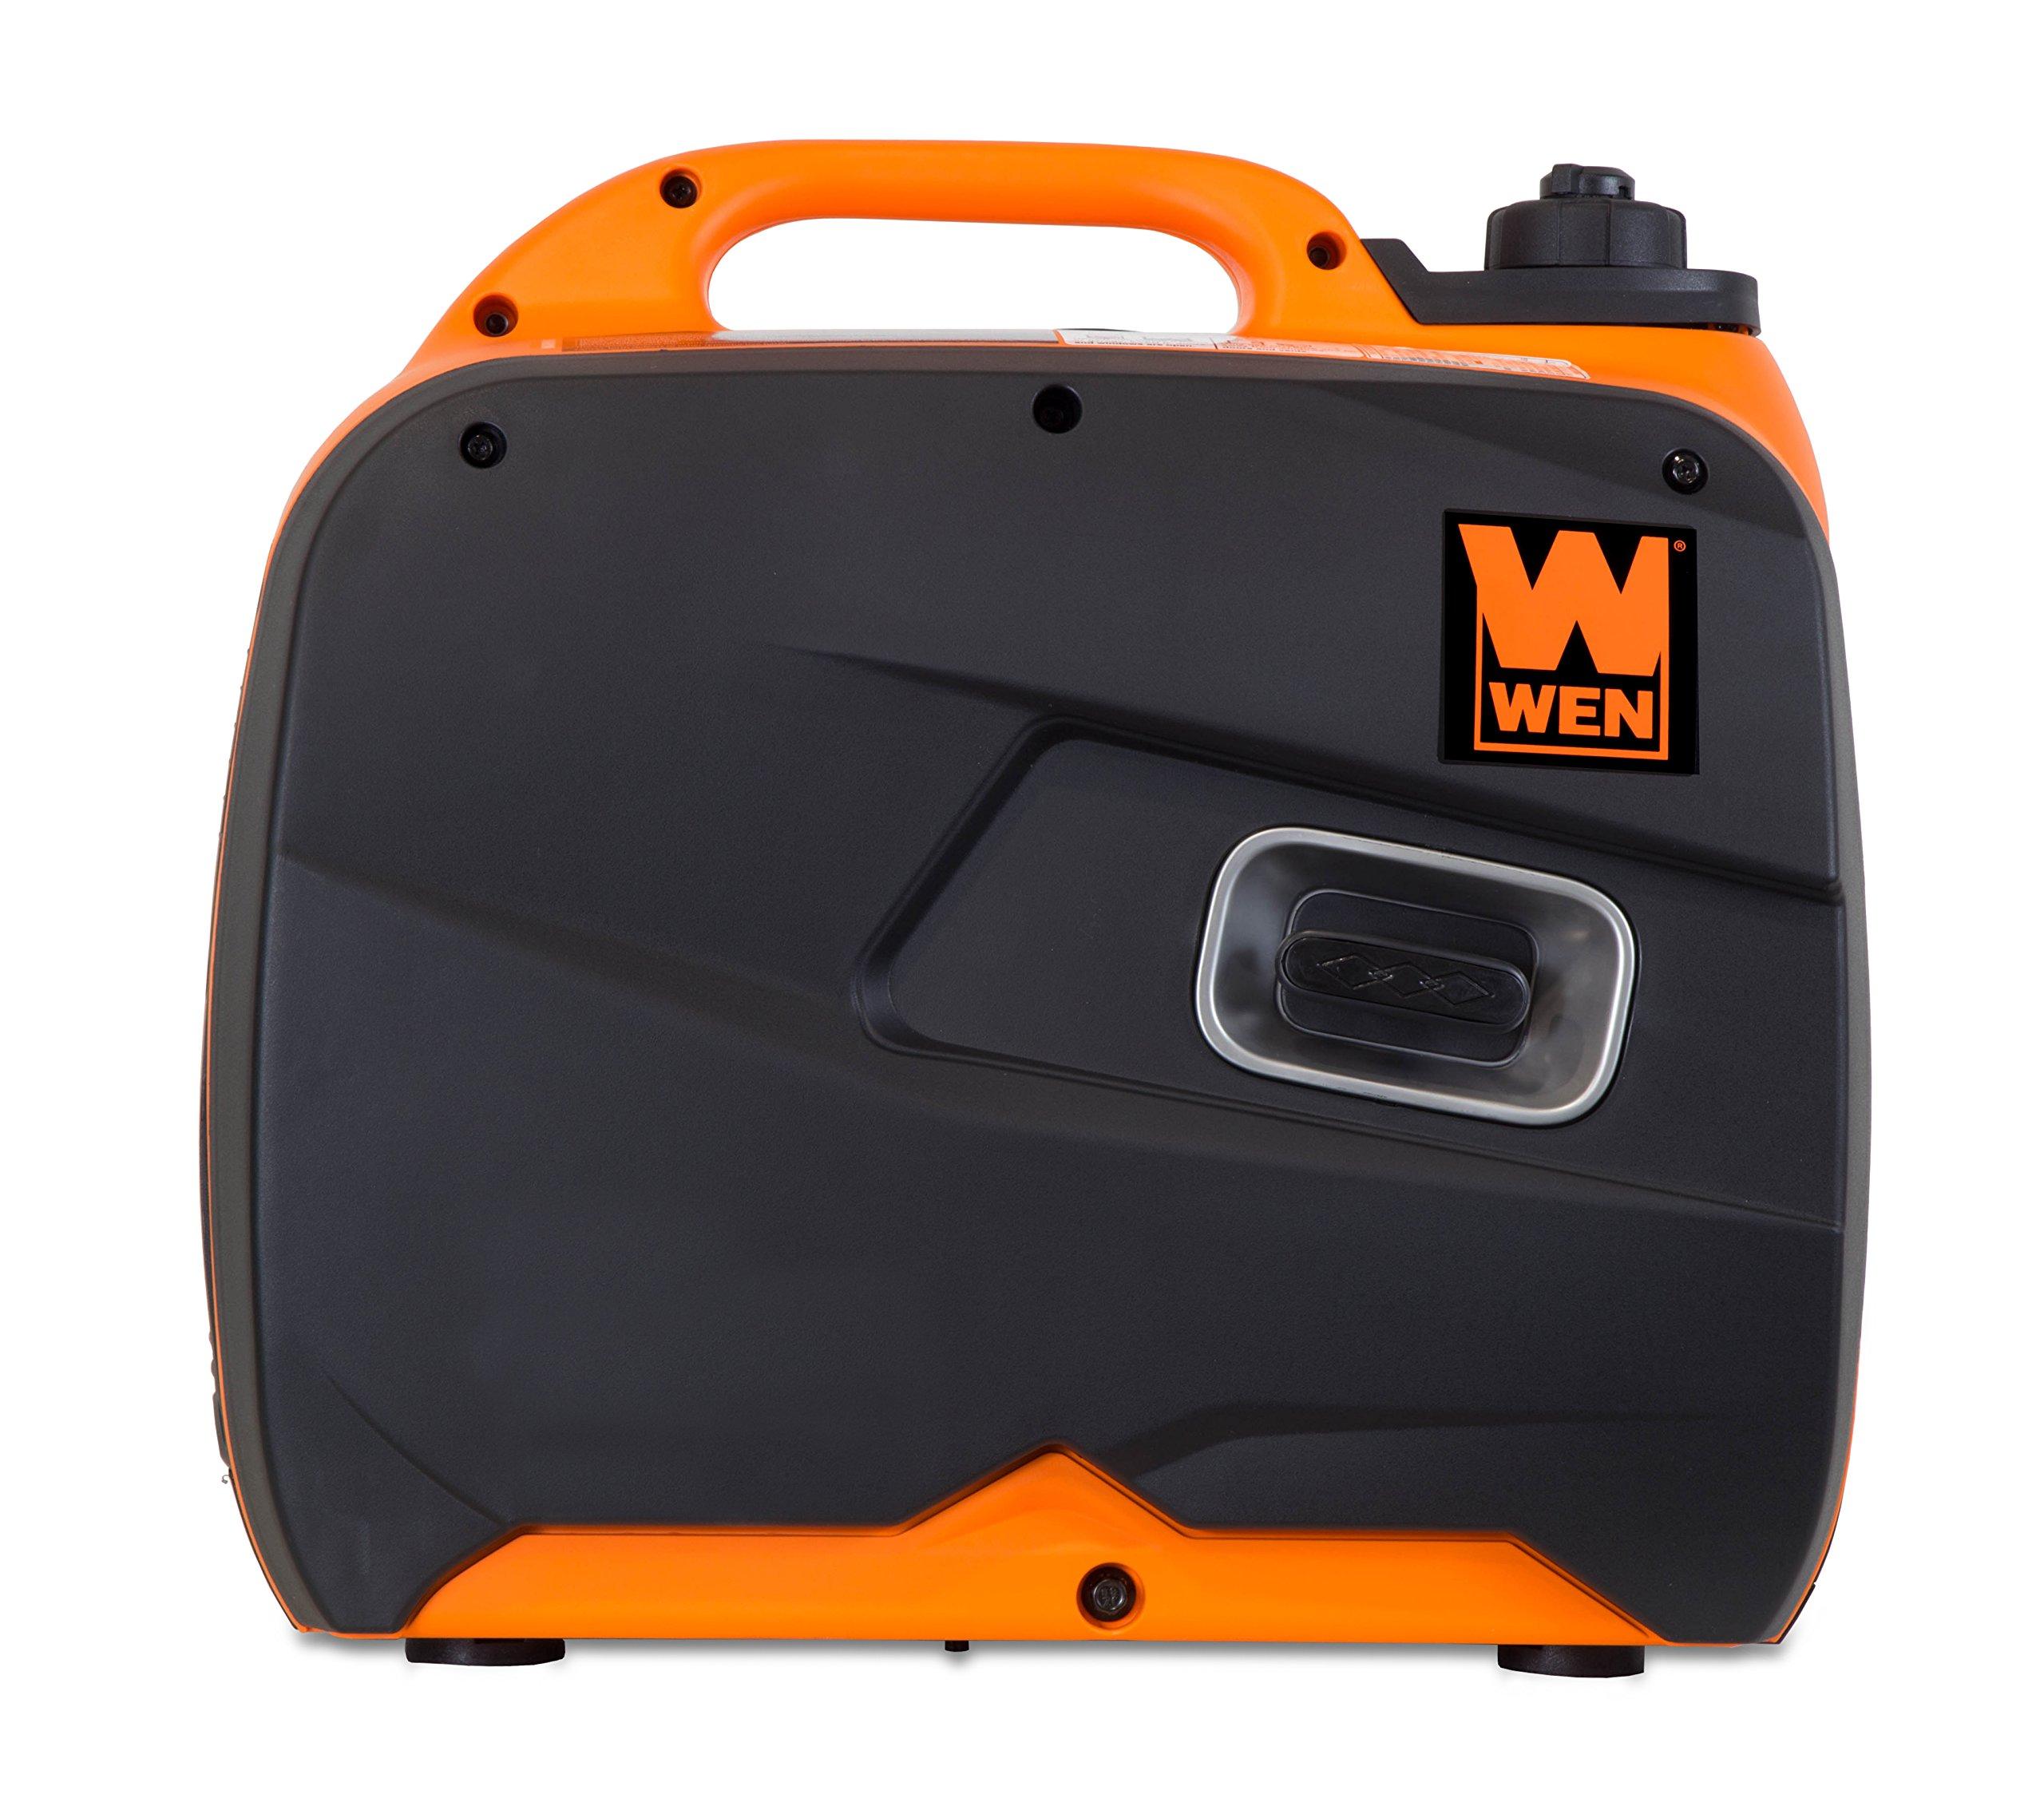 Galleon Wen 56200i Super Quiet 2000 Watt Portable